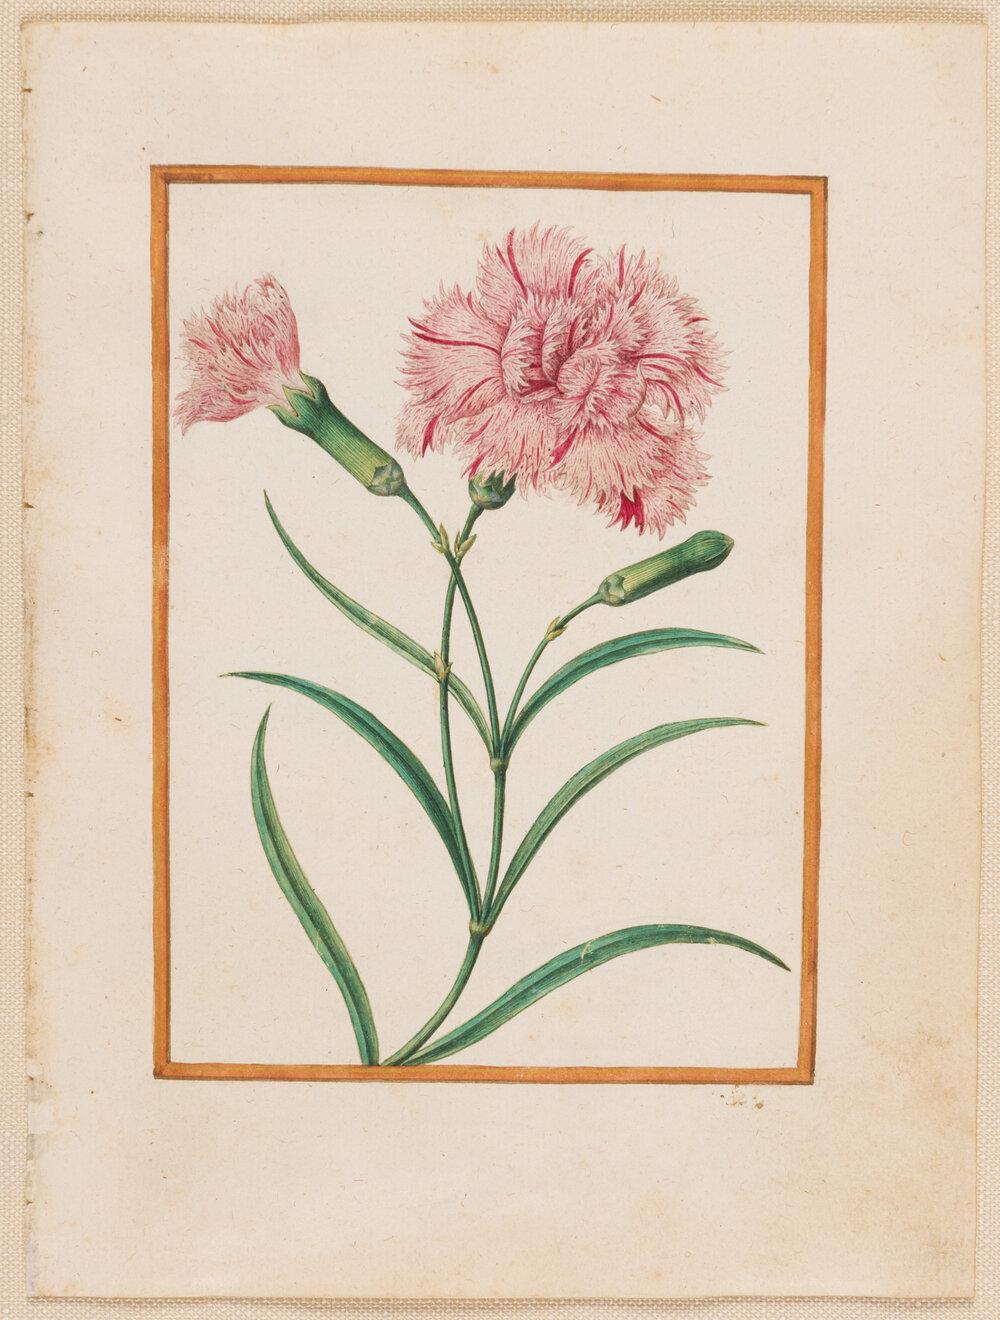 Jacques Le Moyne de Morgues (1533-1588), ' Clove Pinks (Dianthus caryophyllus) ', watercolour and gouache on paper prepared as vellum, 139 x 100 mm.  Image courtesy of  Stephen Ongpin Fine Art .